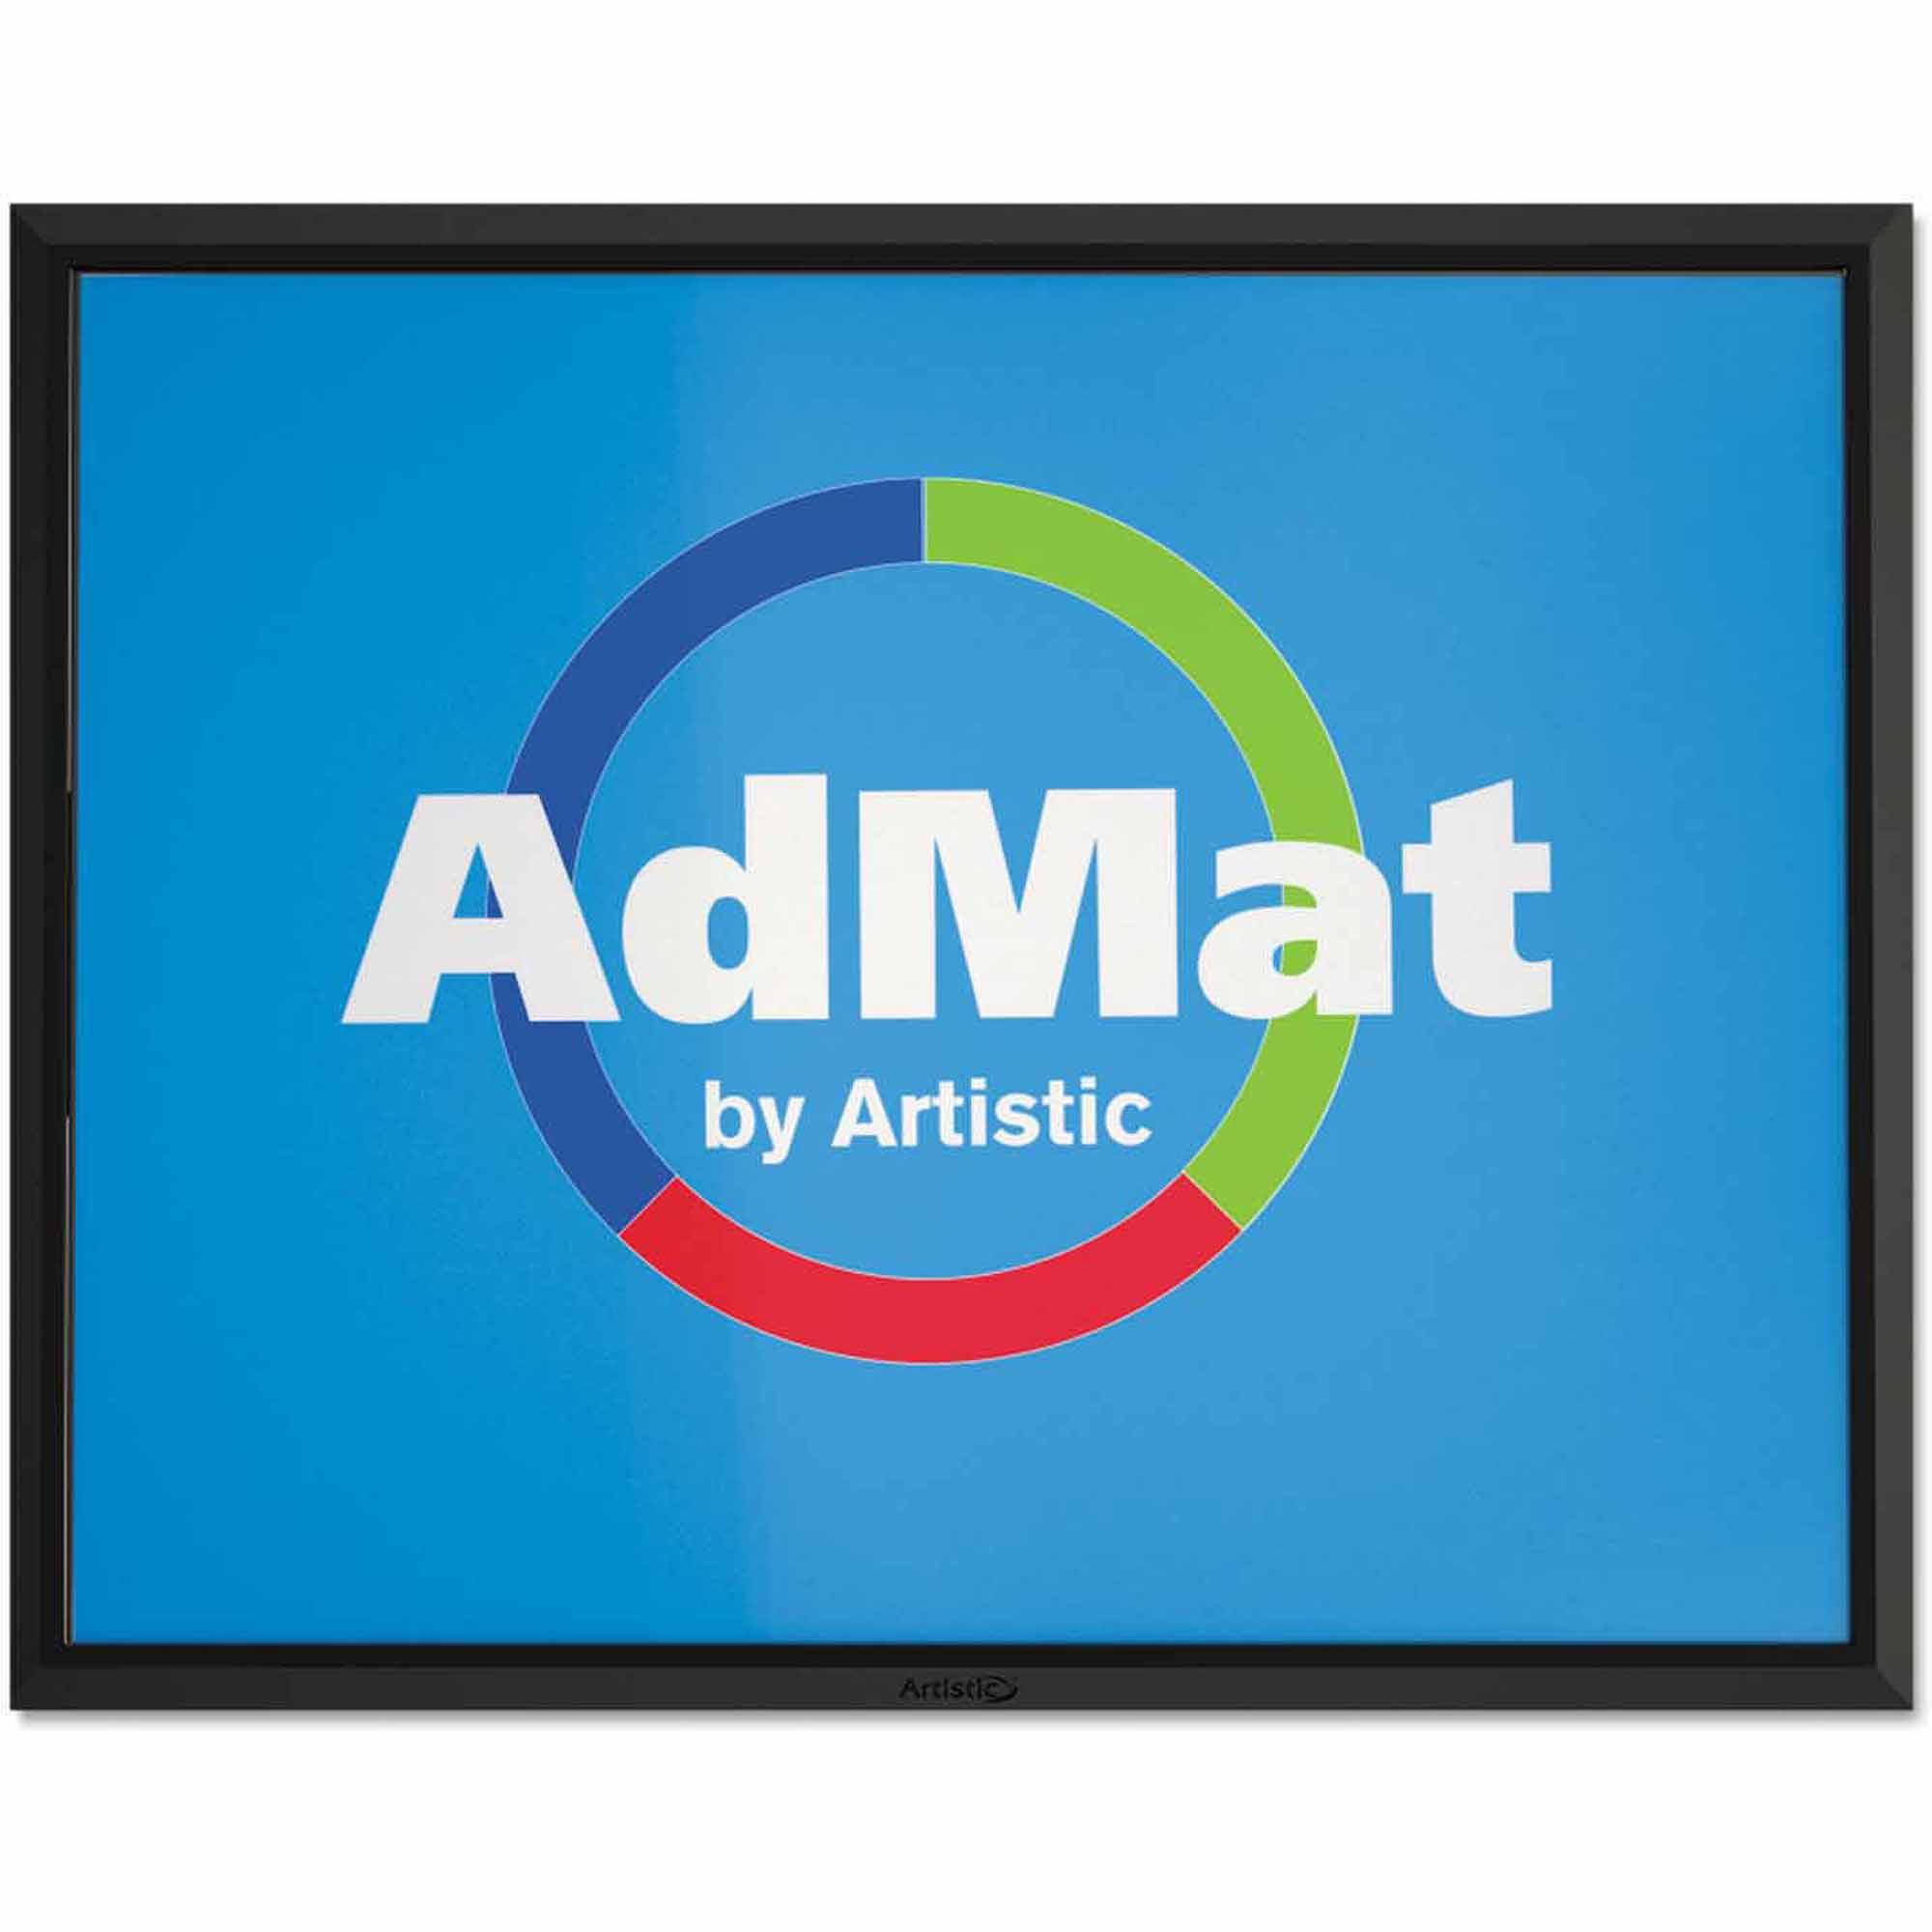 "Artistic 8-1/2"" x 11"" AdMat Countertop Mat, Black"